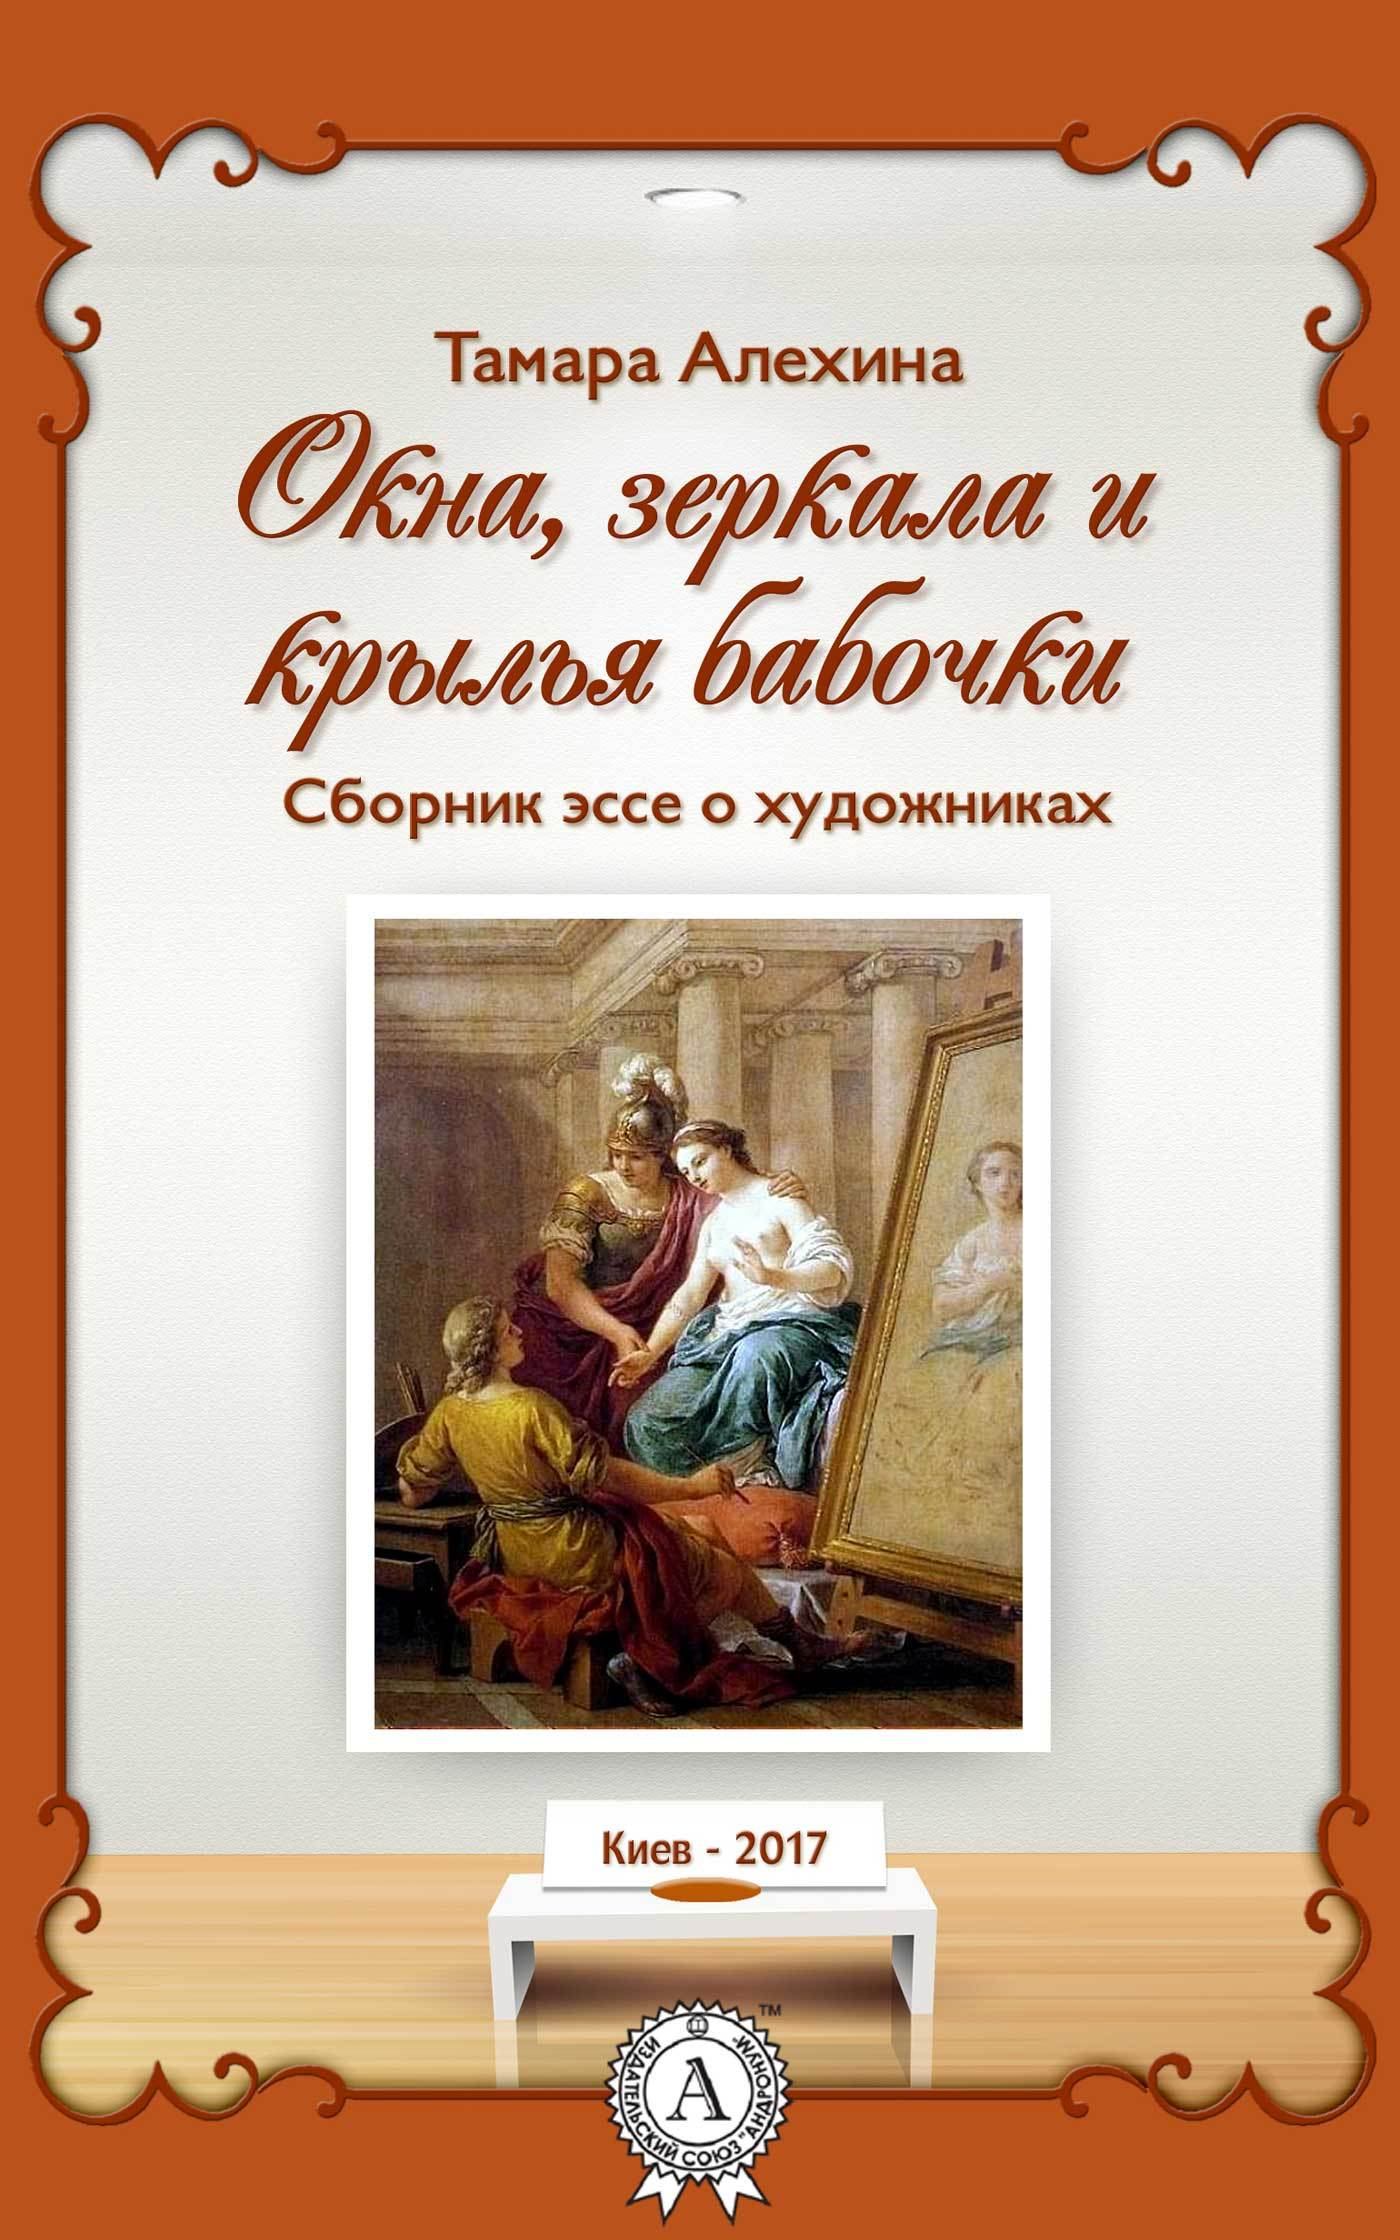 Тамара Алехина Окна, зеркала и крылья бабочки. Сборник эссе о художниках крылья бабочки 39х46